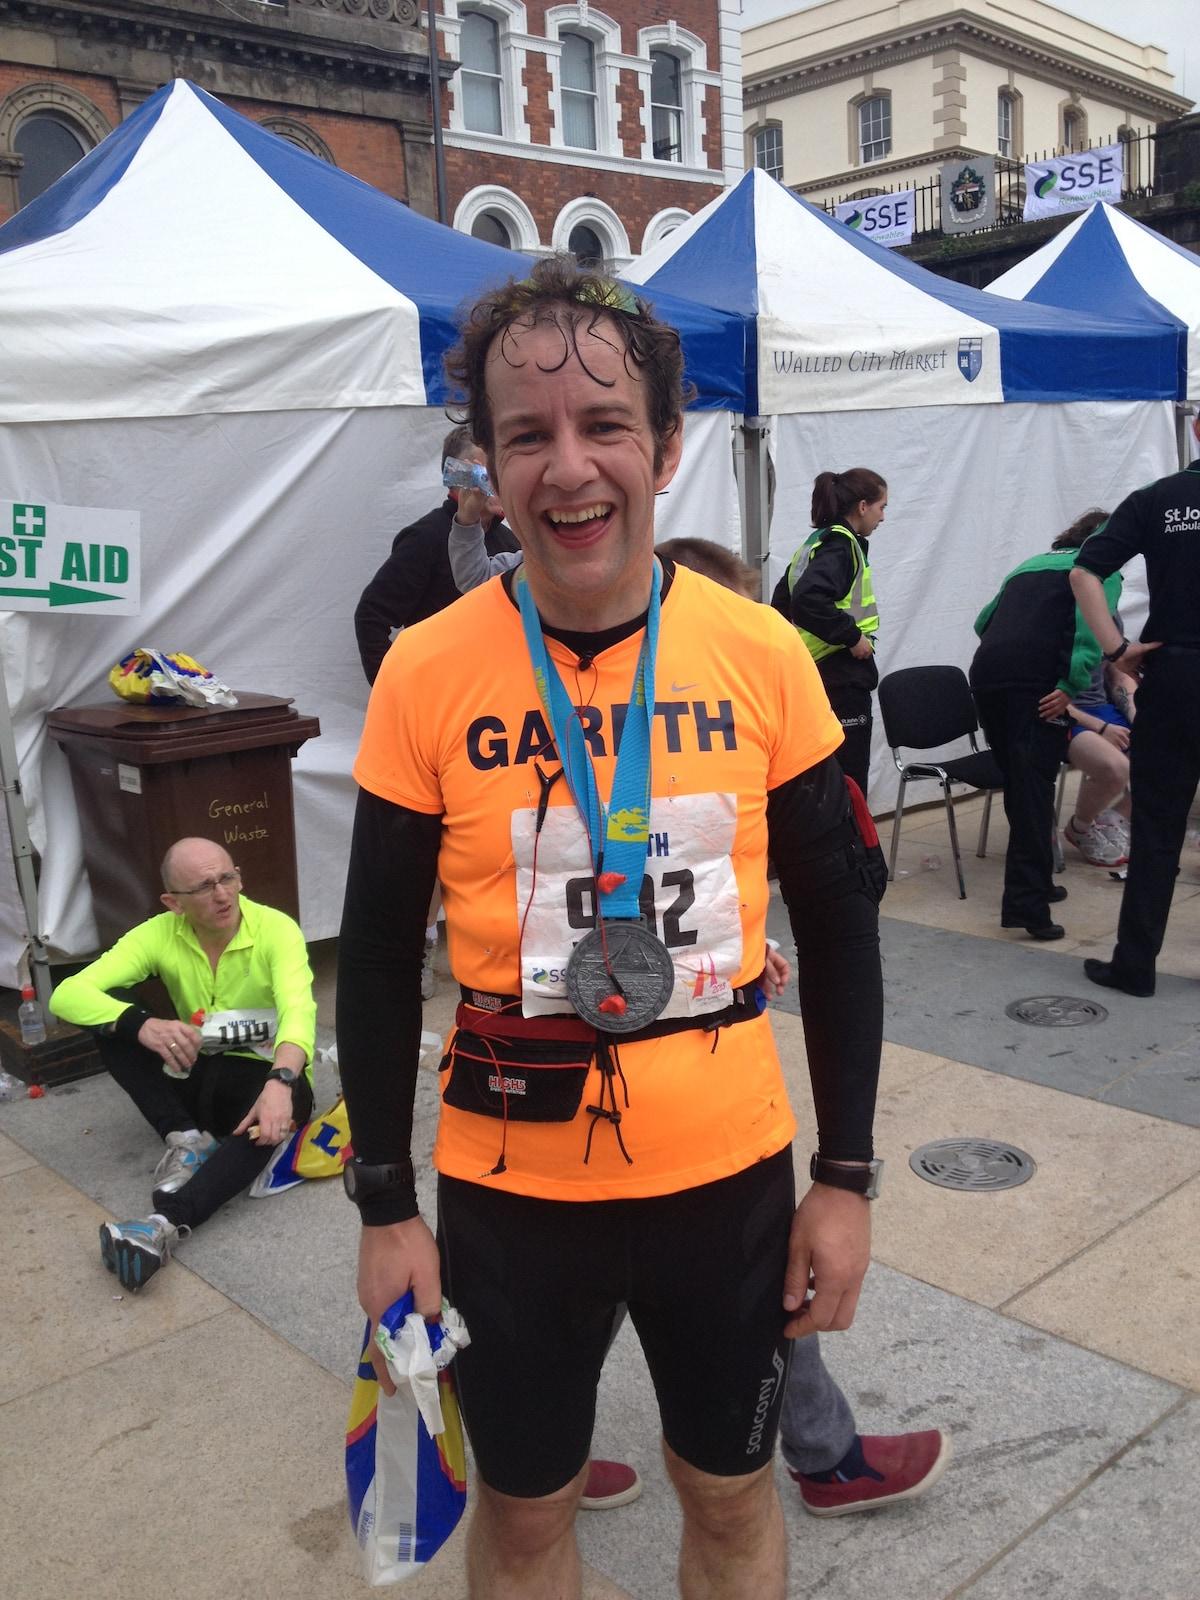 Gareth from Dublin